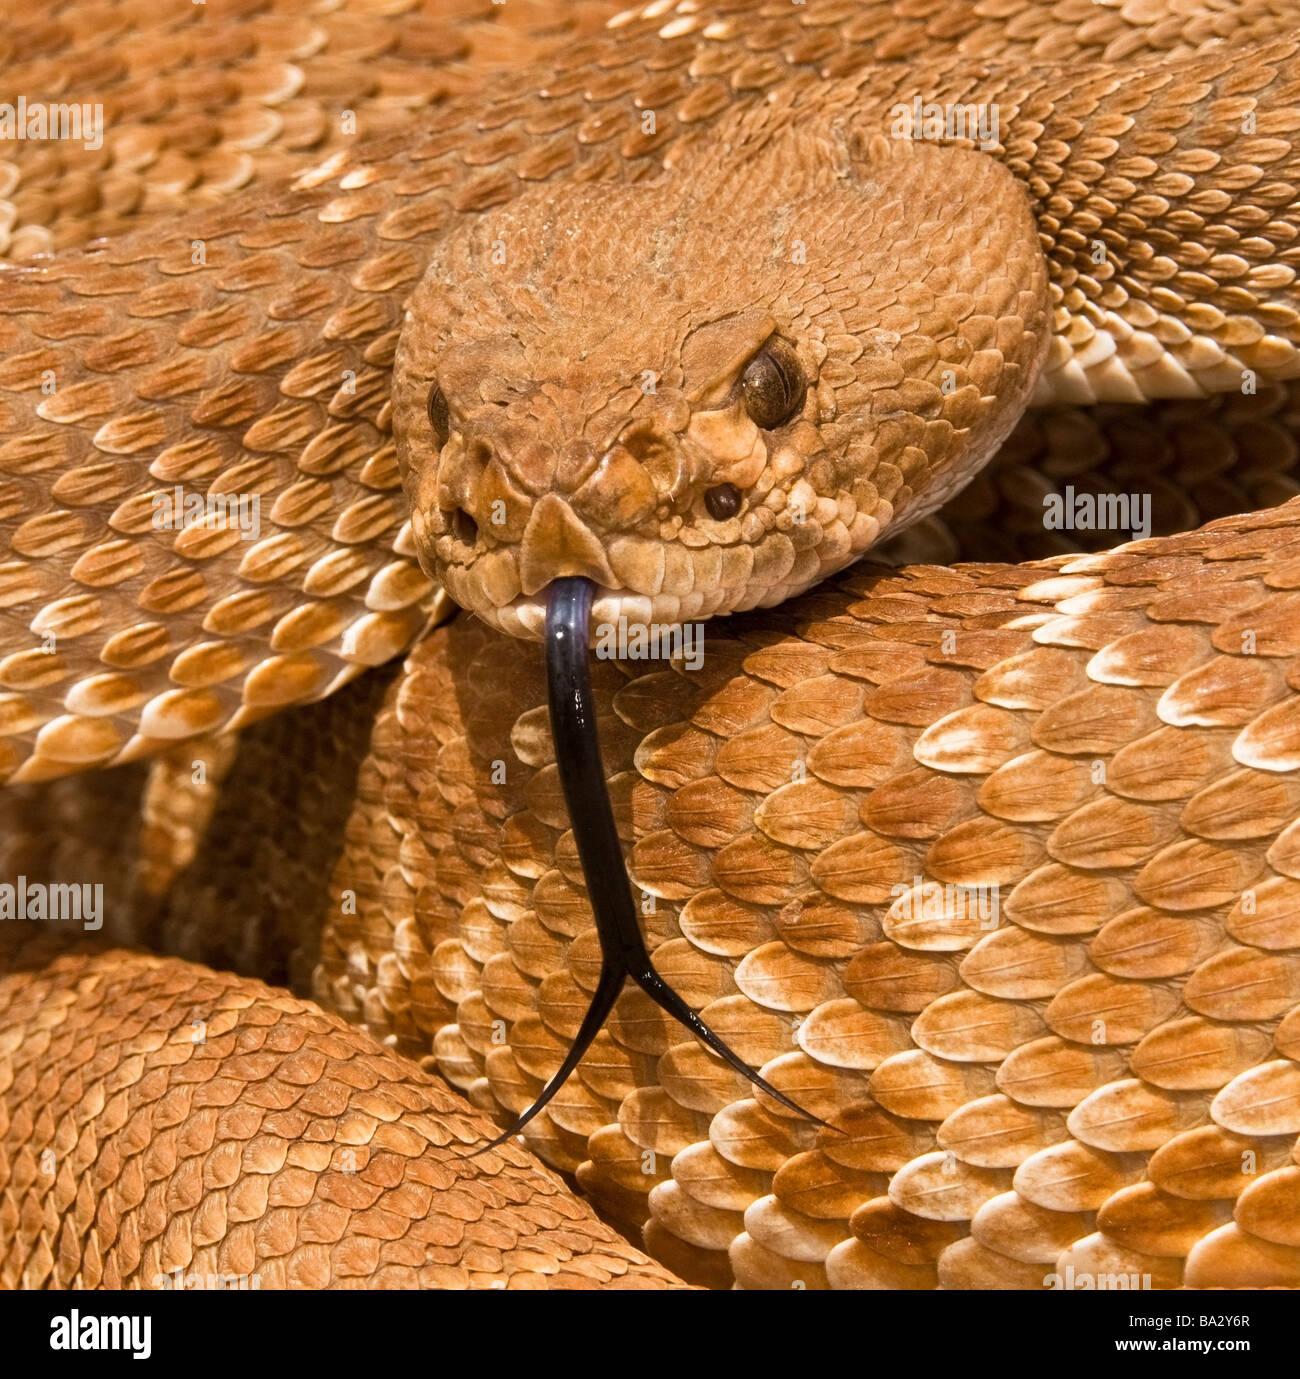 Red-diamond rattlesnake(Crotalus ruber), Riverside County, California, USA; rattlesnake posturing defensively - Stock Image